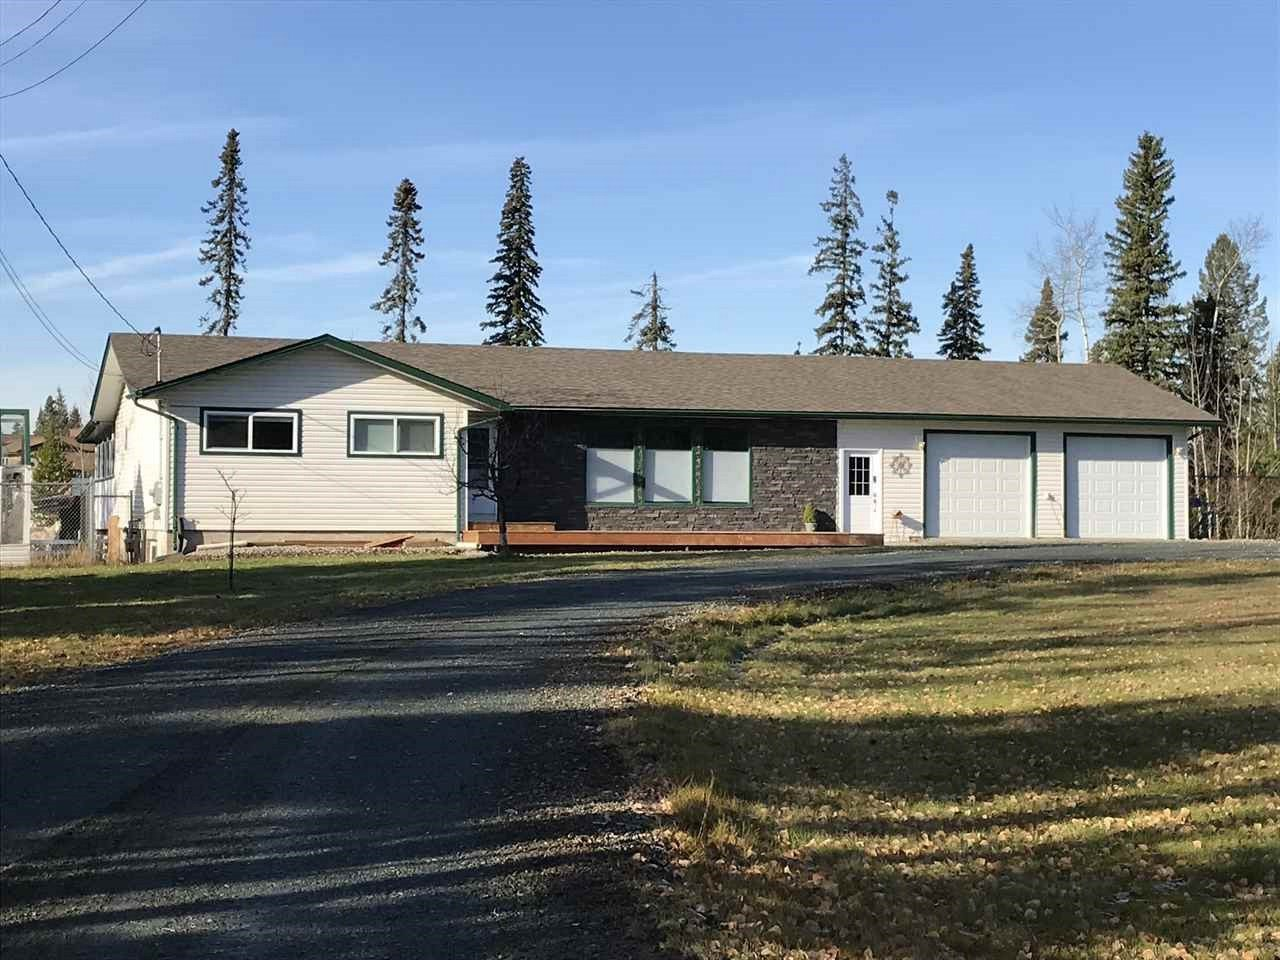 Main Photo: 11405 ELDON ROAD in : Beaverley House for sale : MLS®# R2236409